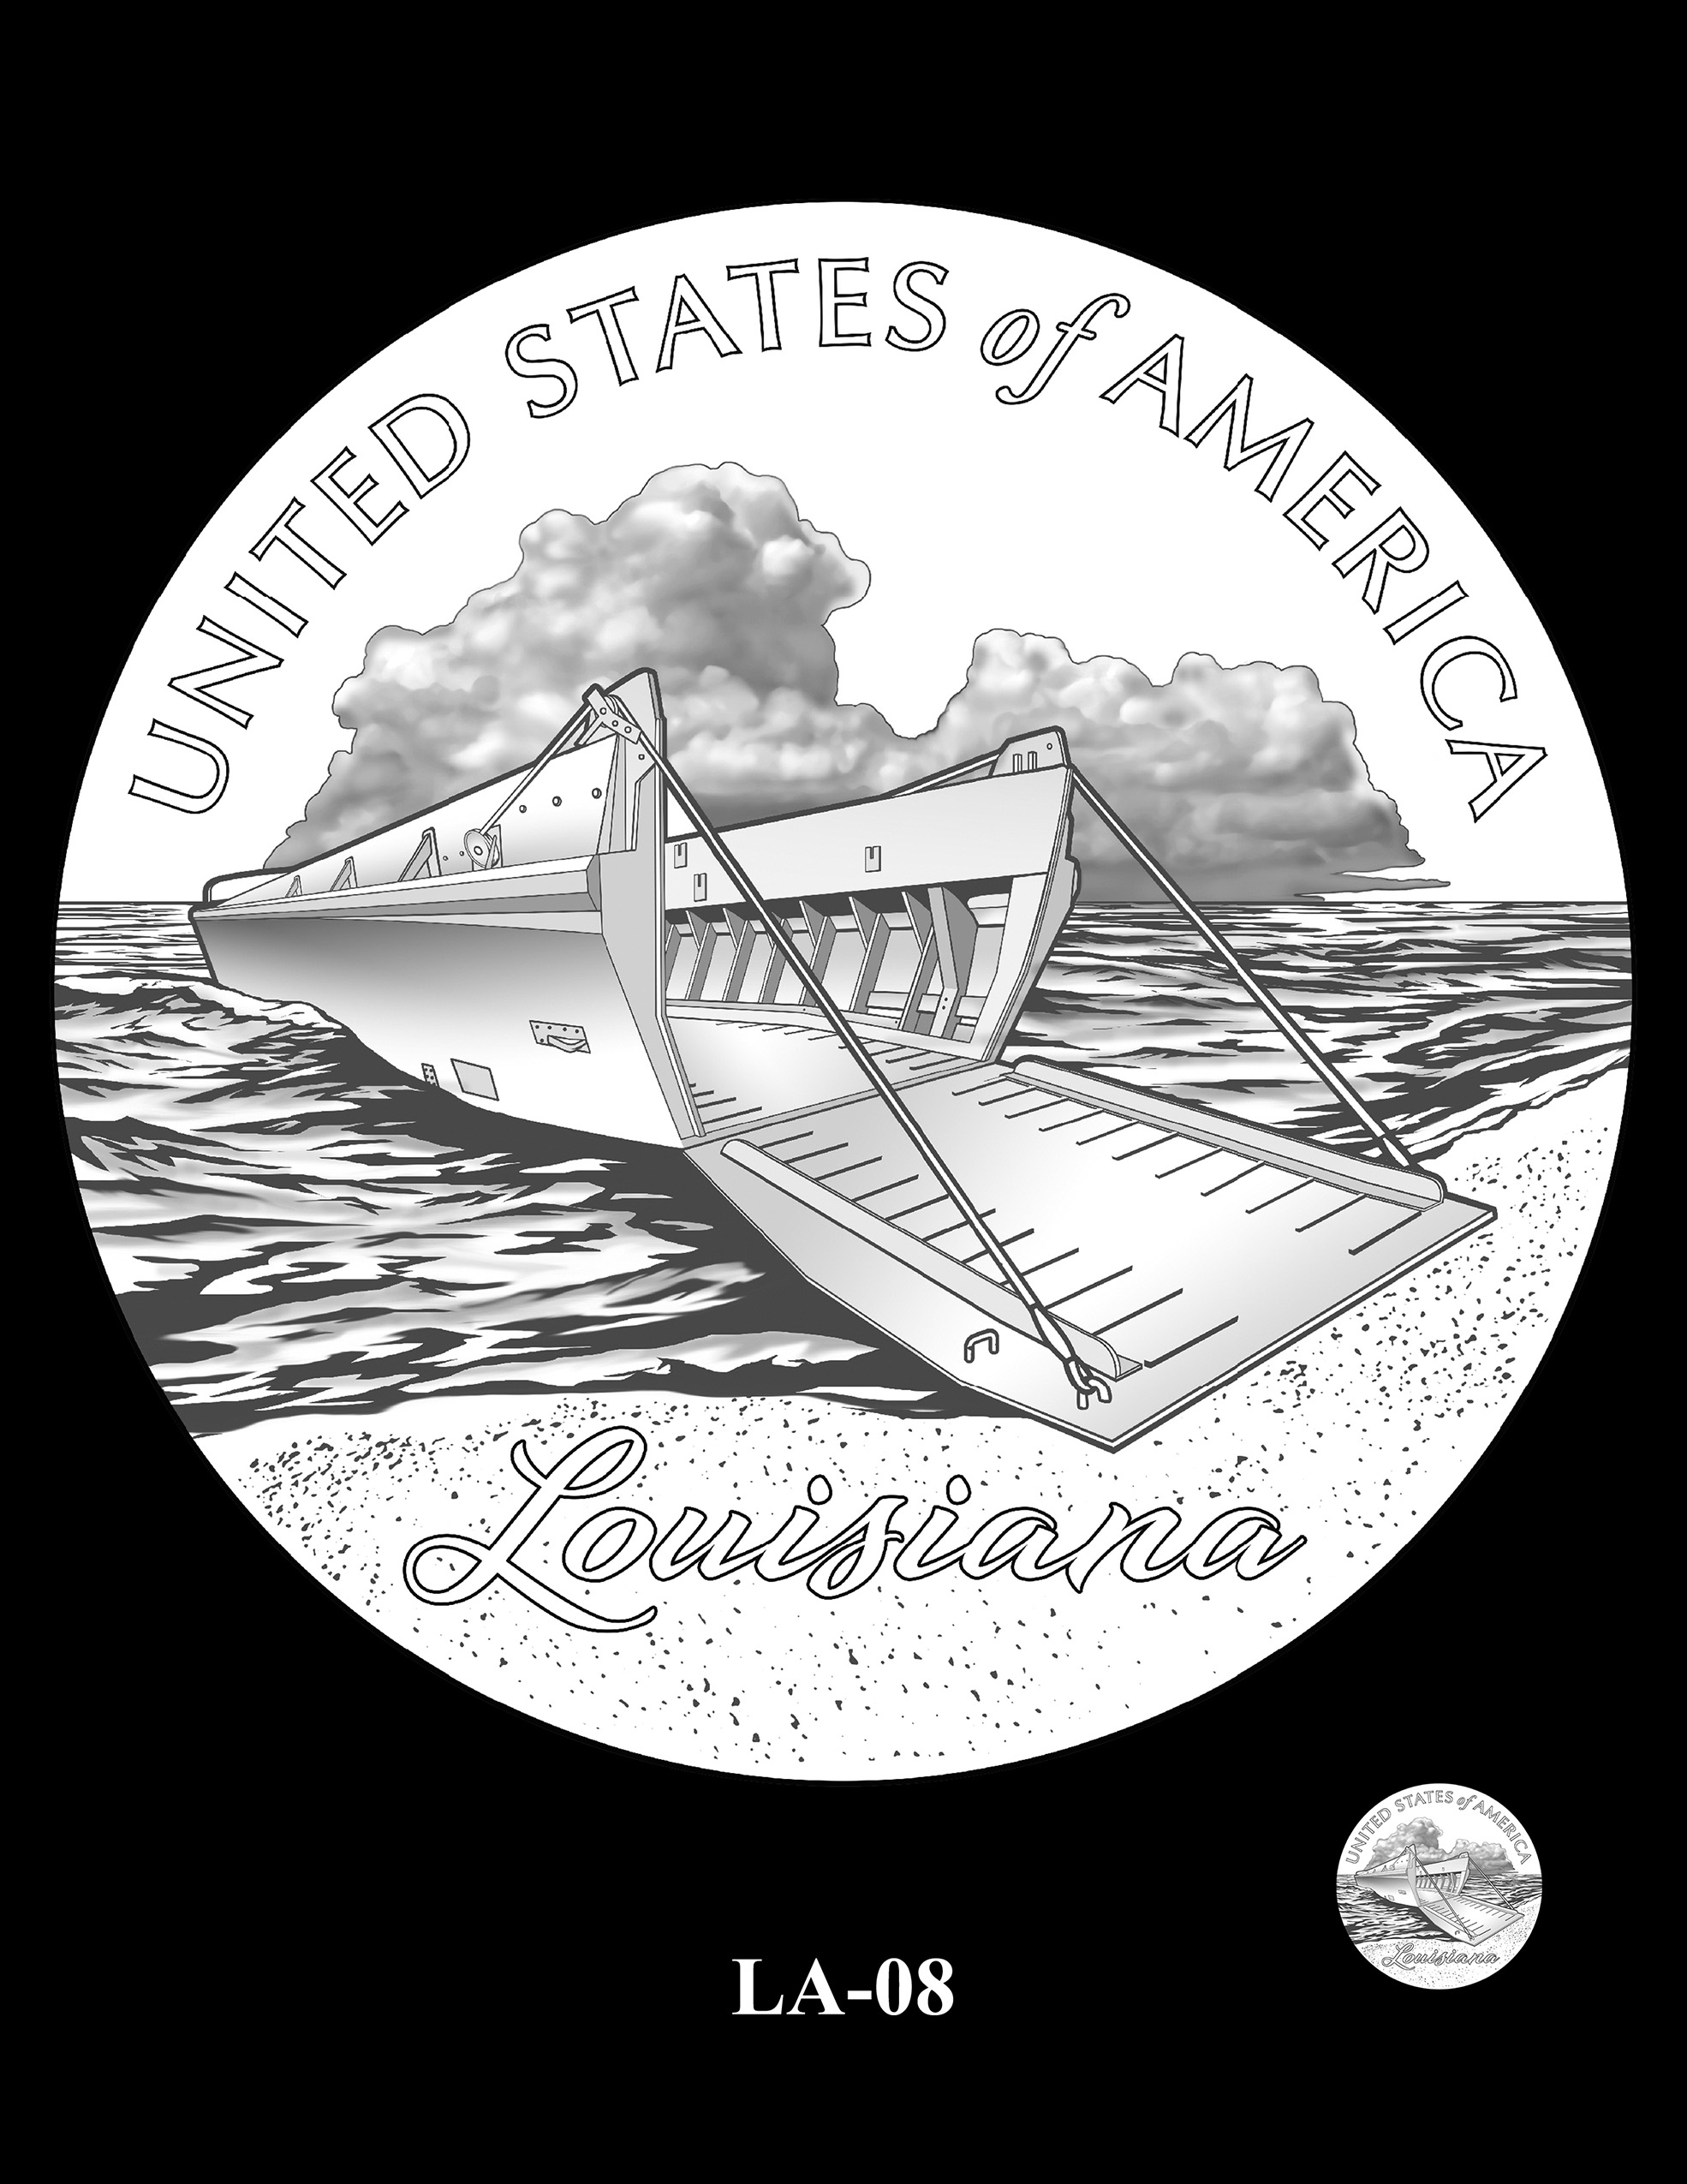 LA-08 -- 2023 American Innovation $1 Coin Program - Louisiana